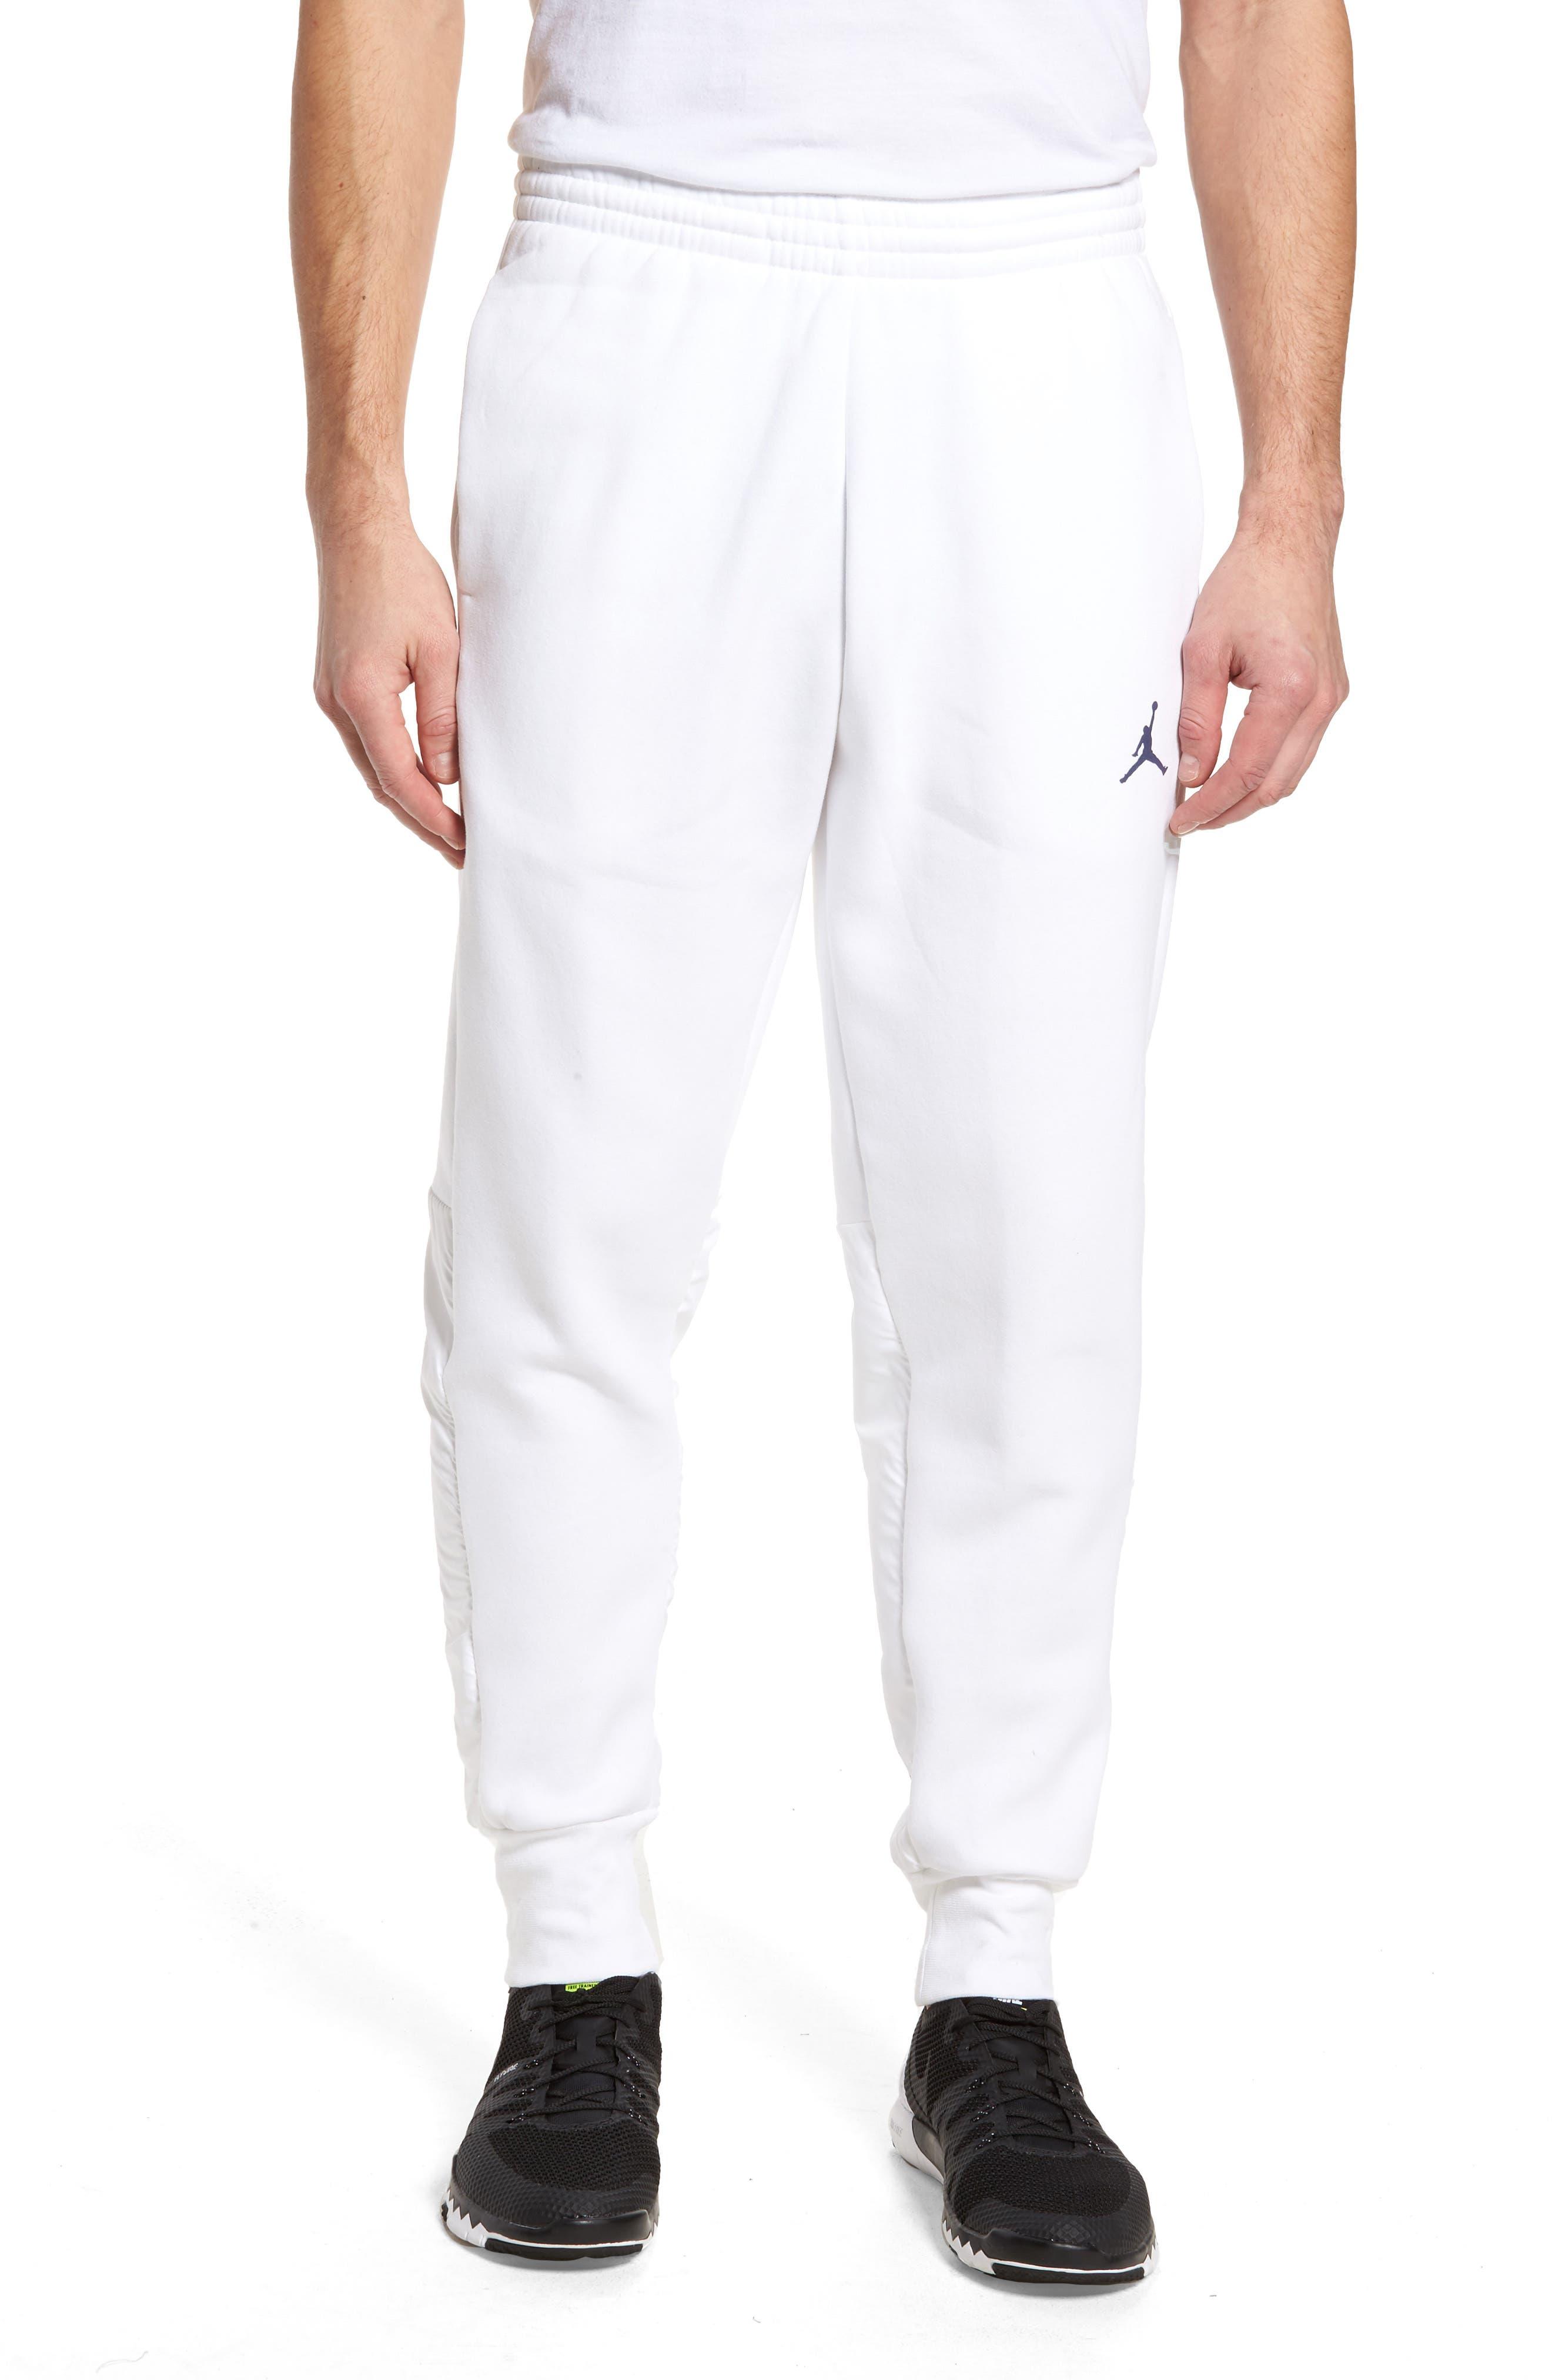 Jordan AJ11 Hybrid Pants,                         Main,                         color, White